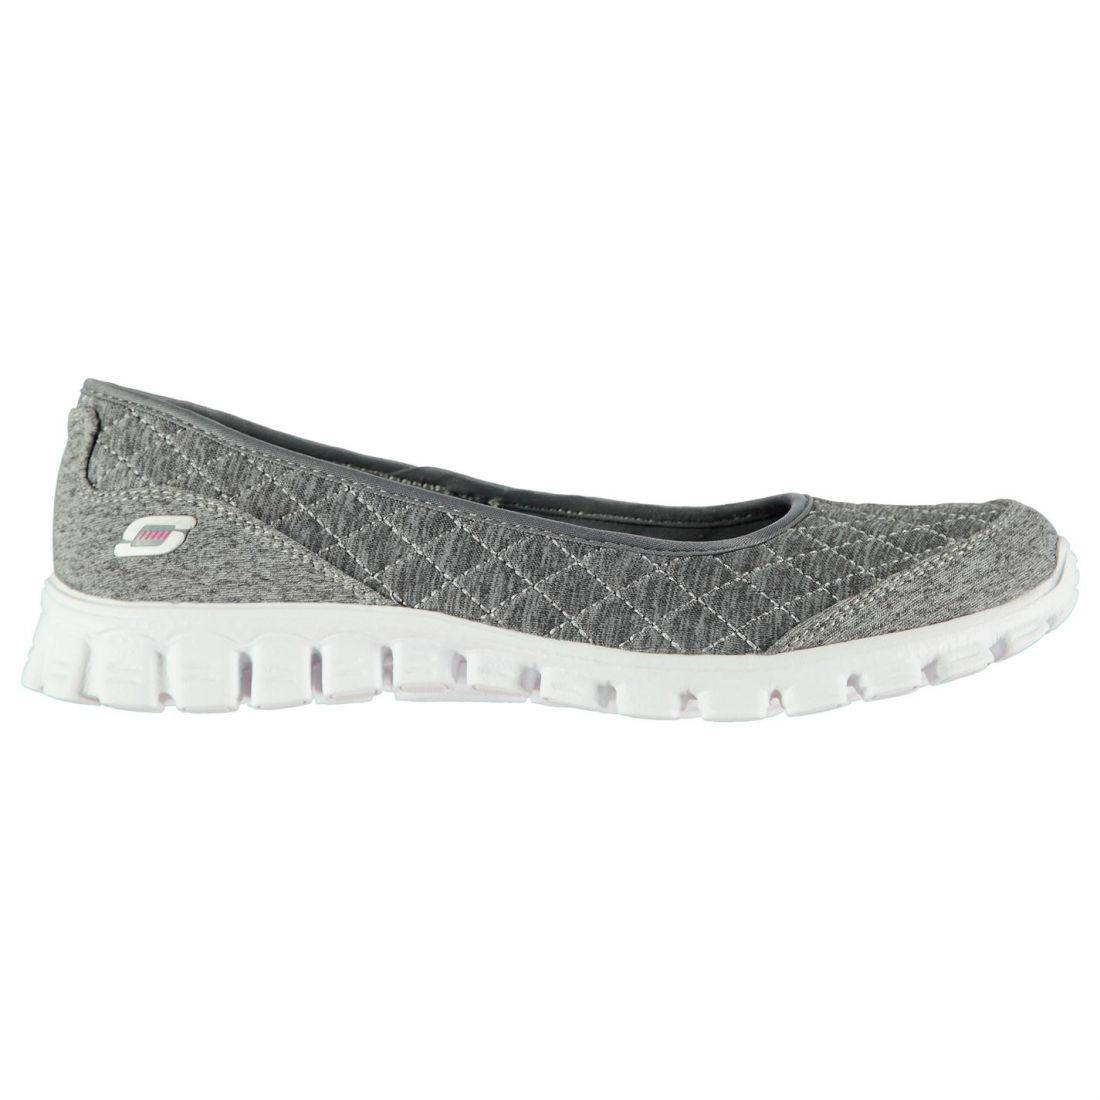 f84b2a72af93 Details about Skechers Womens Ladies EZ Flex 2 Slip On Trainers Flat Sports  Shoes Insole